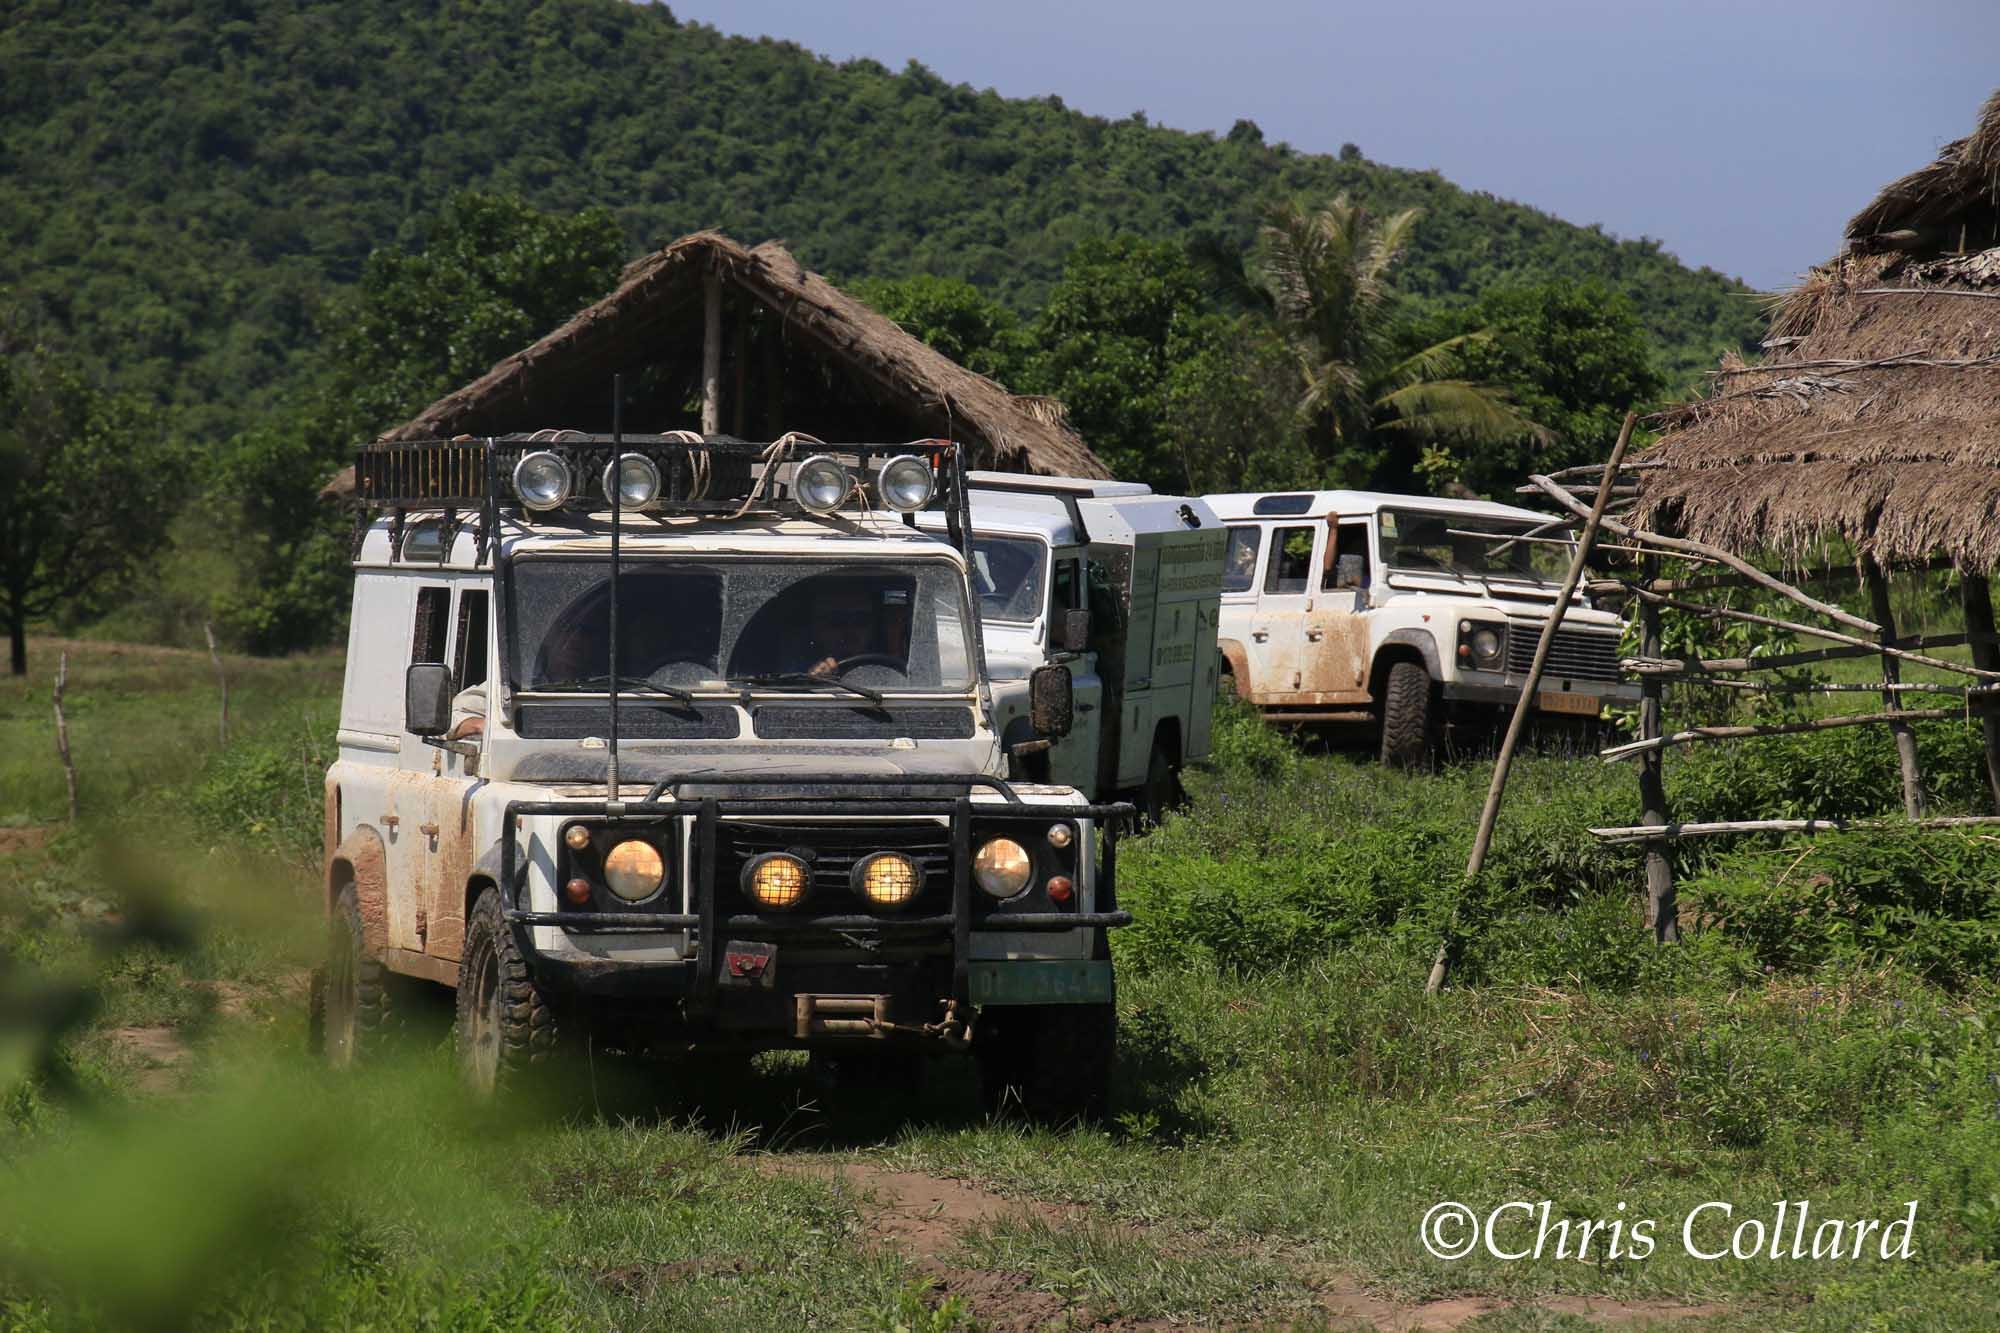 2015 Collard -  Cambodia 002